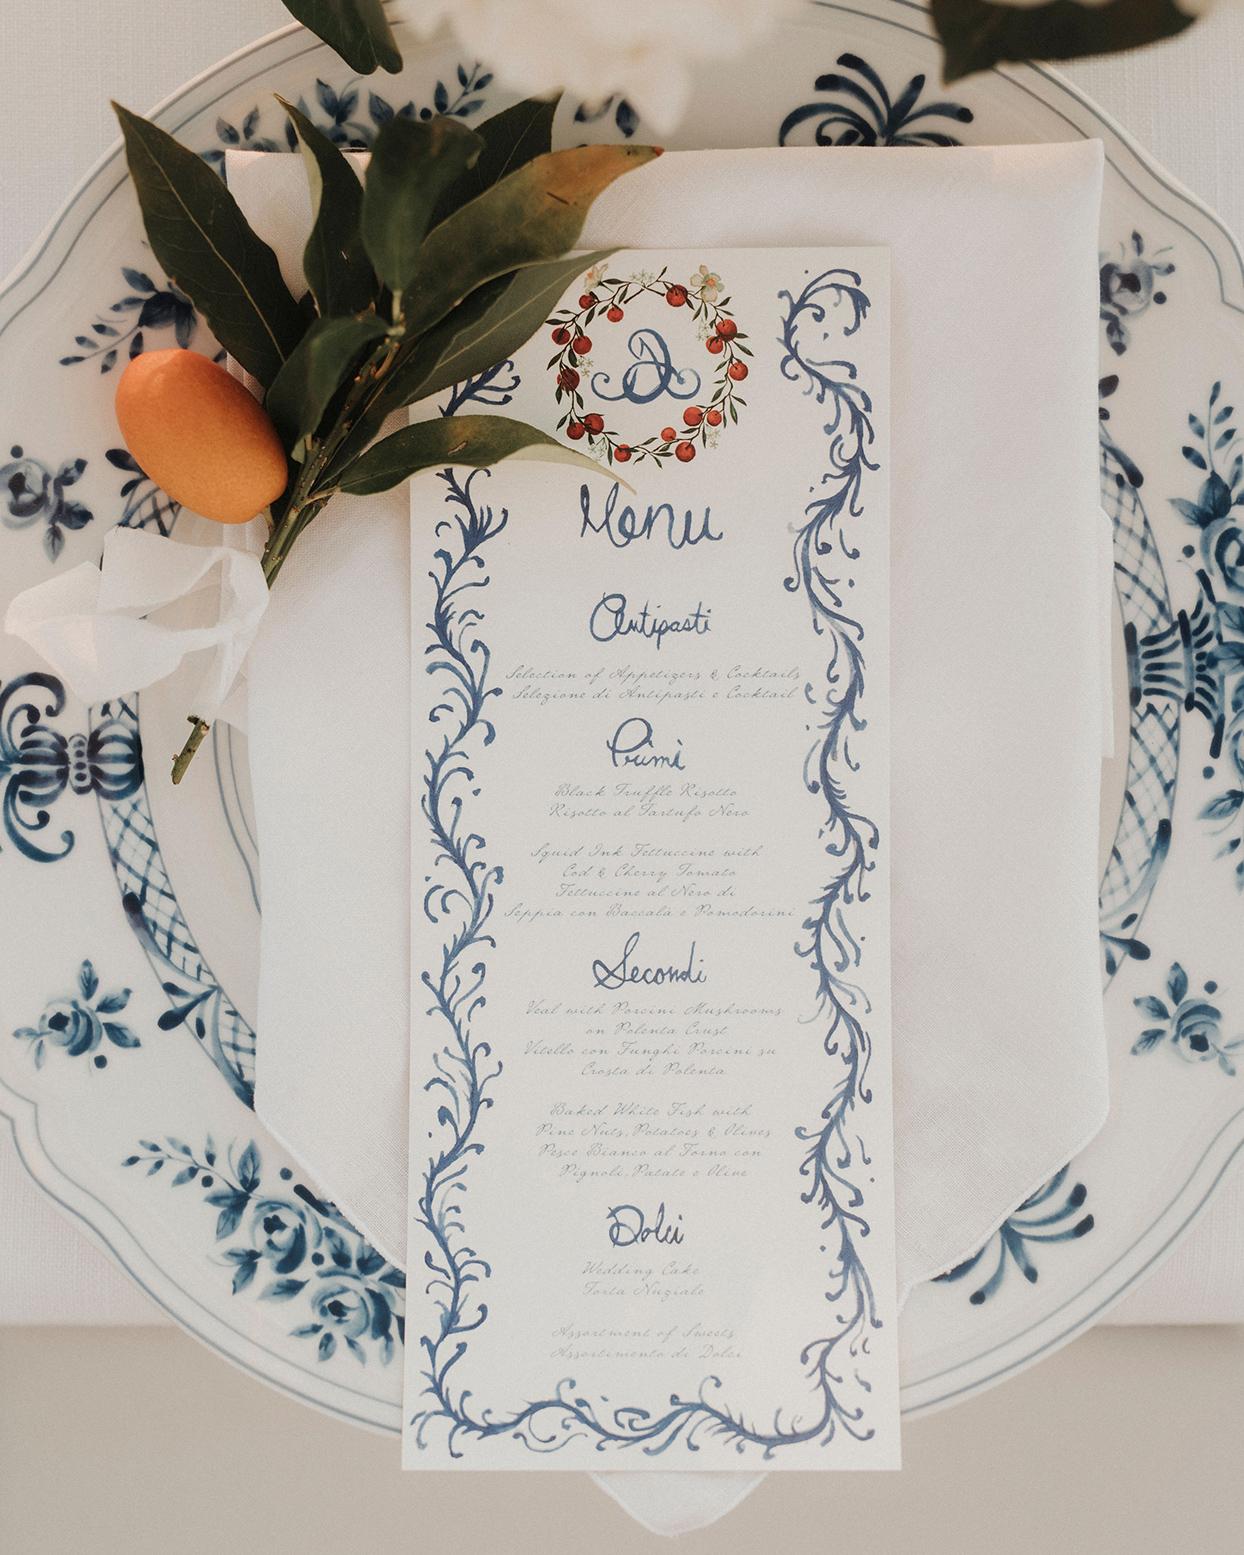 jaclyn antonio watercolor menu place setting